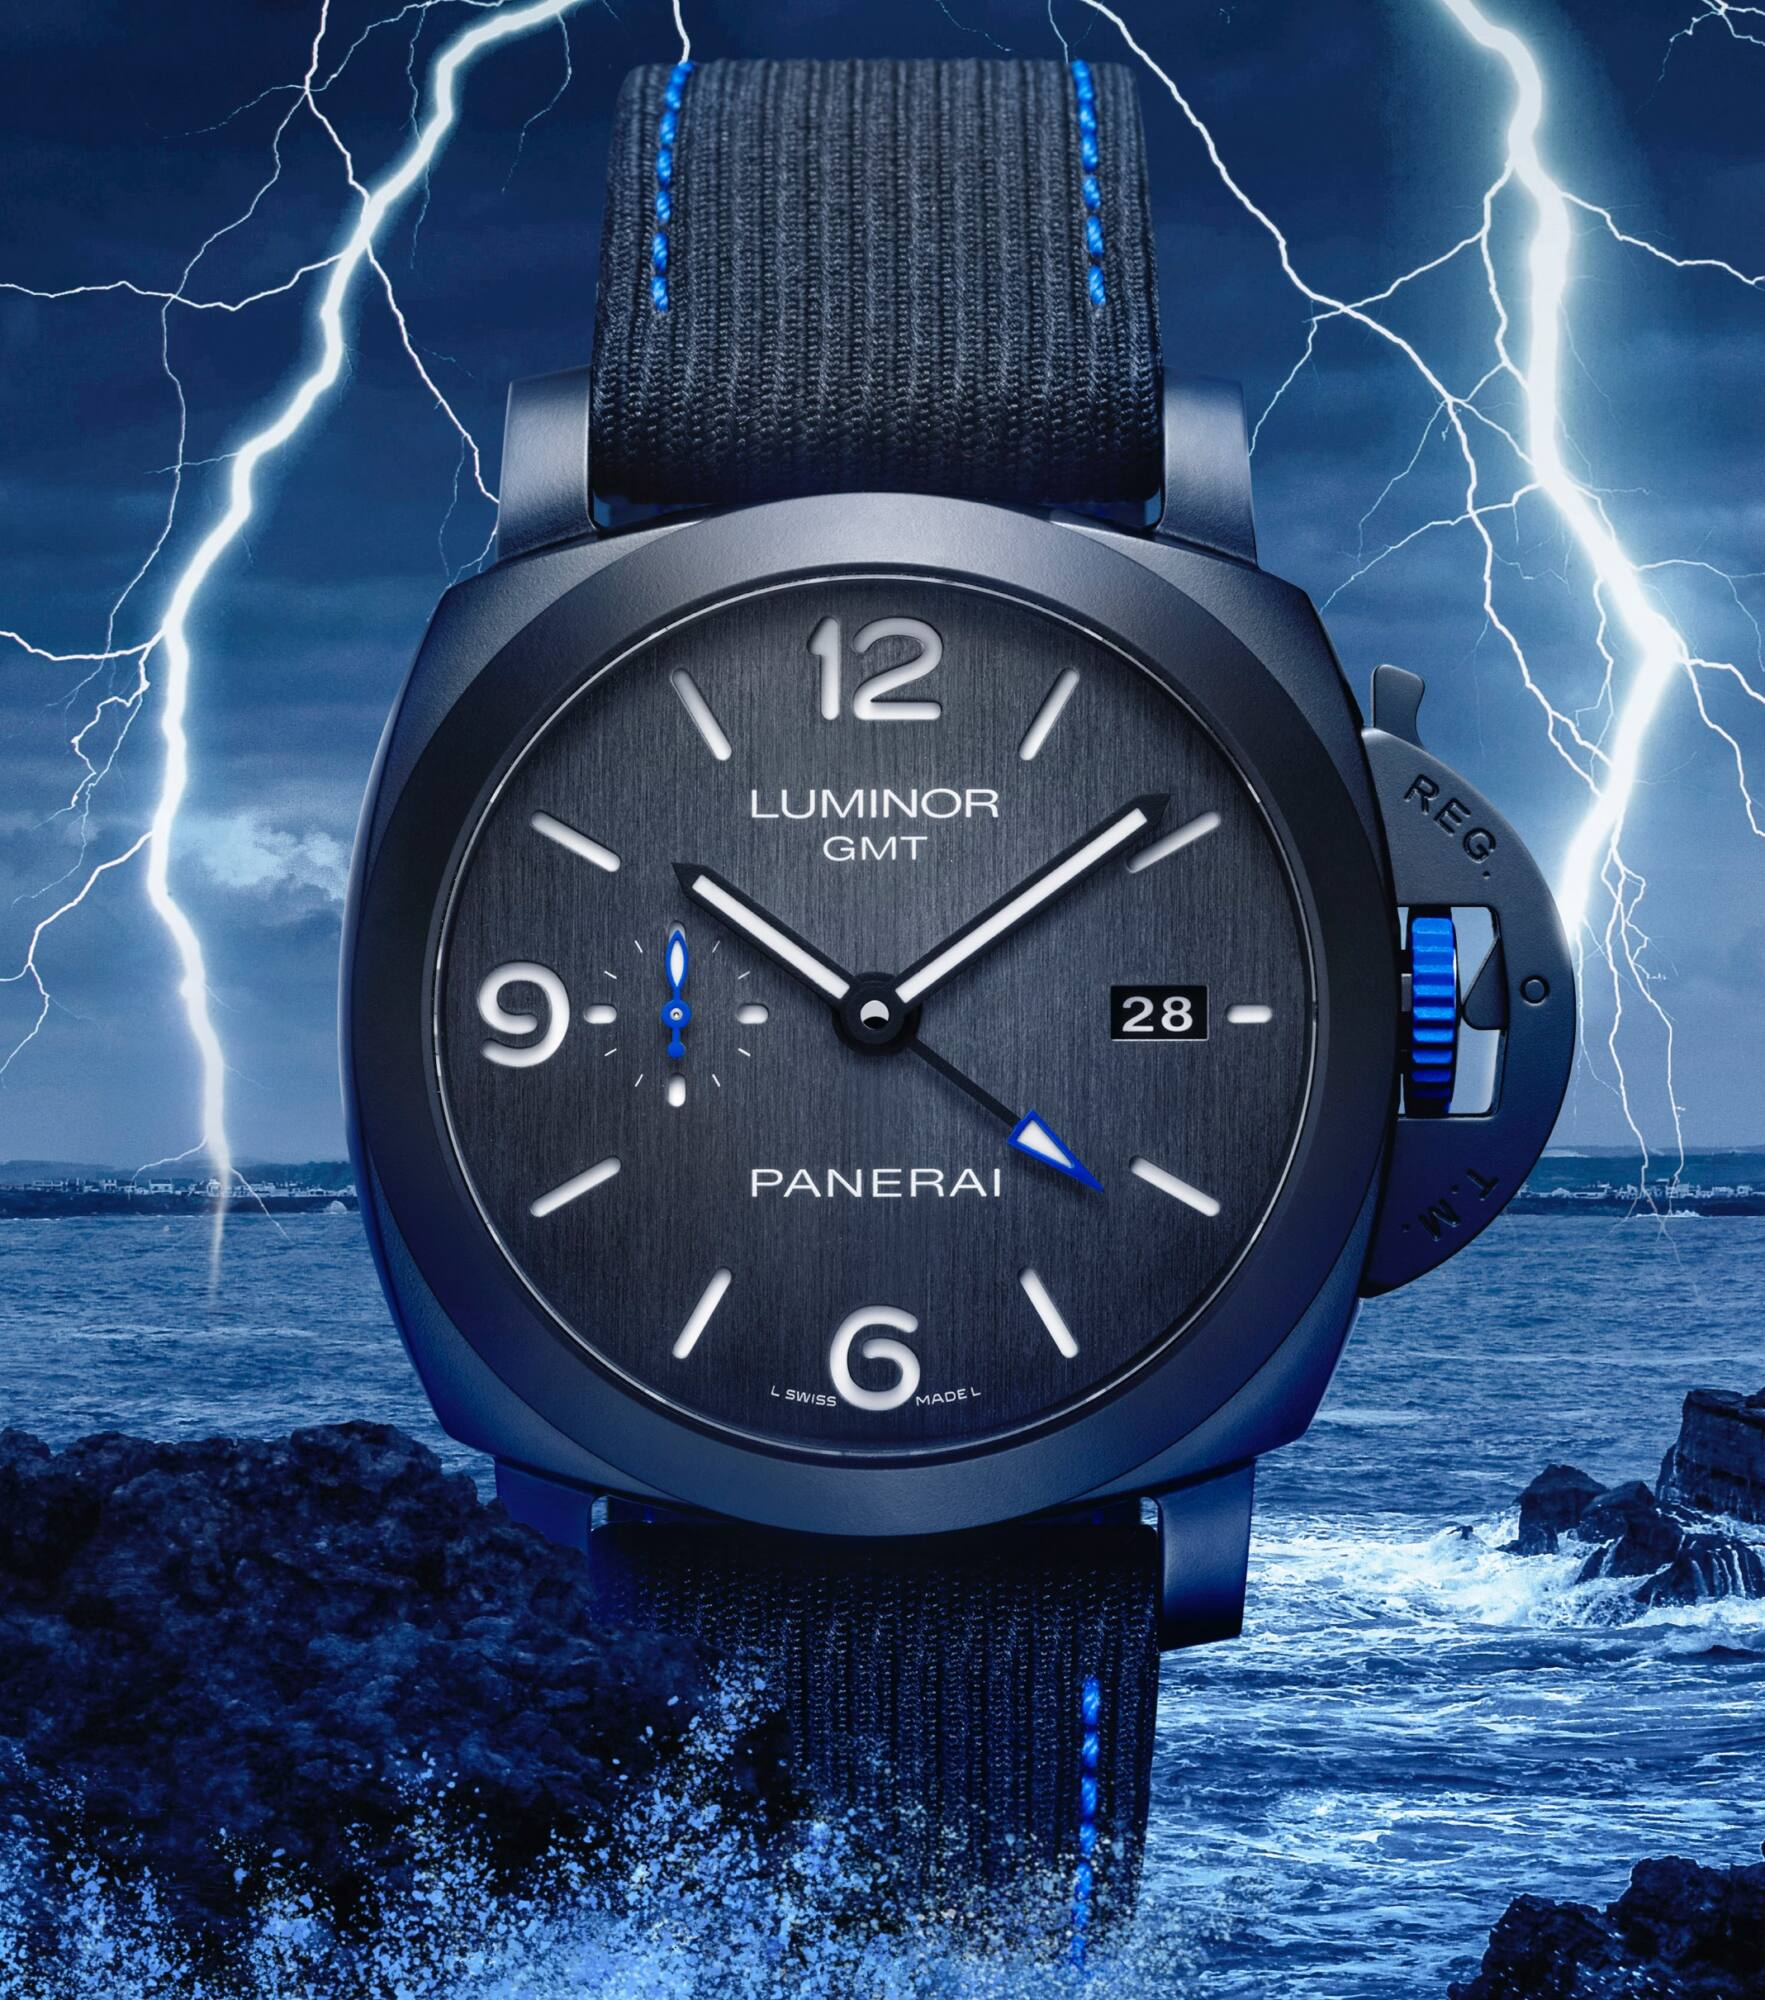 Panerai Luminor GMT Bucherer Blue - MondaniWeb